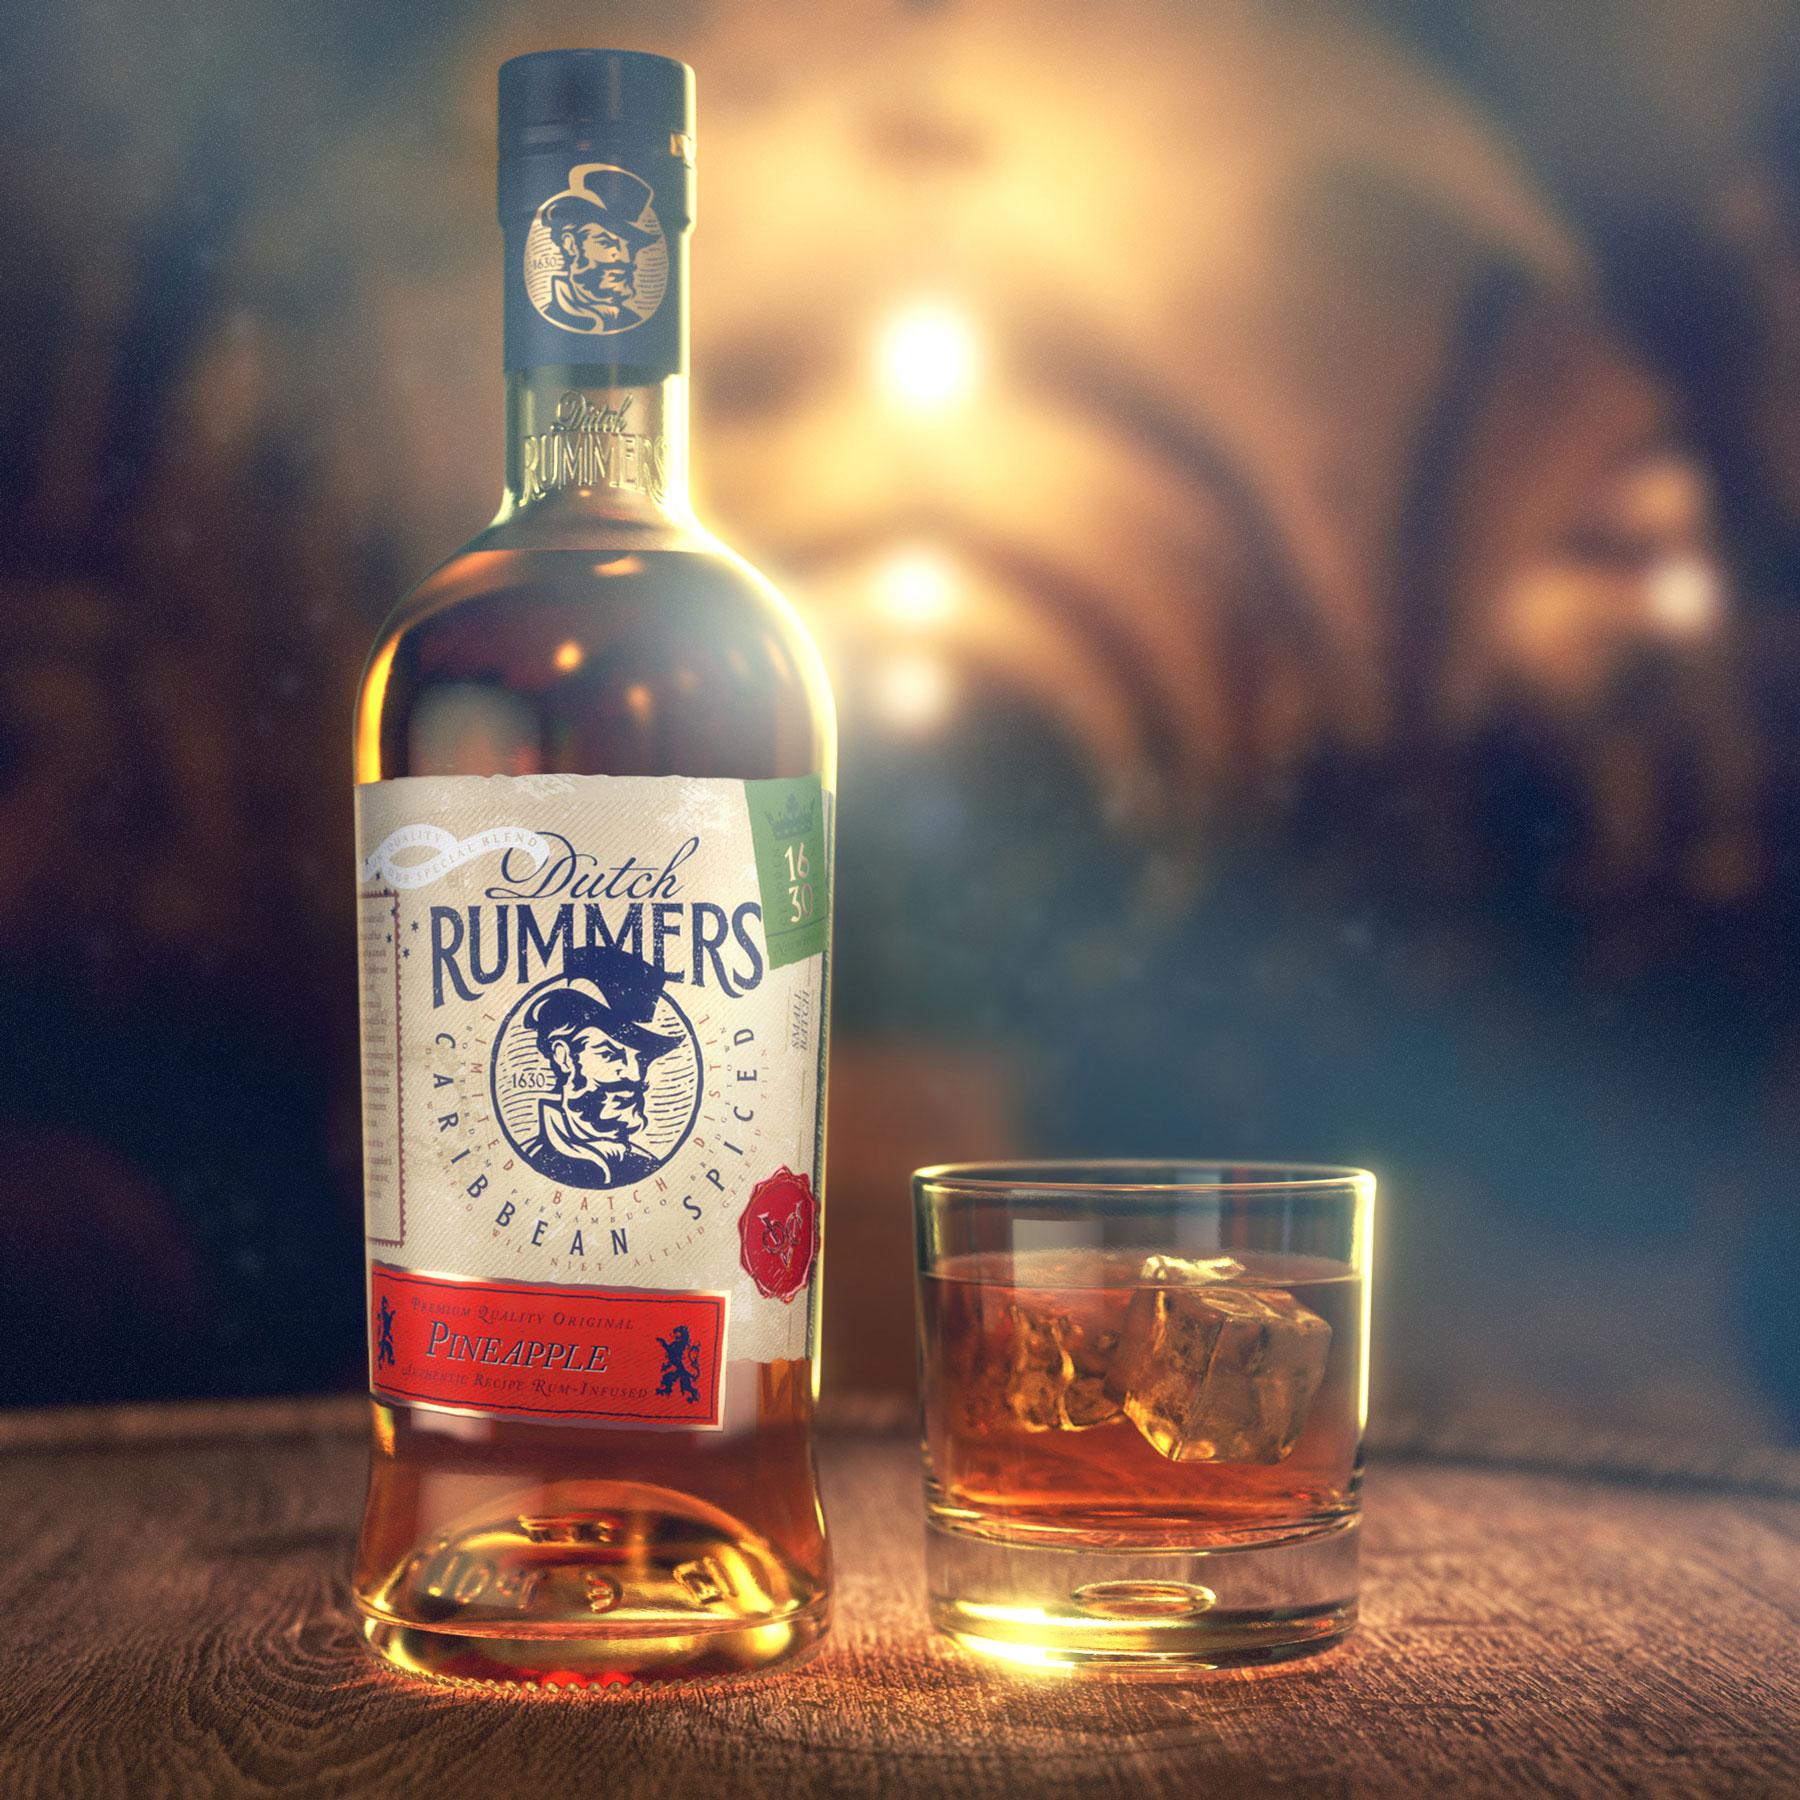 Dutch Rummers by Limegreentangerine